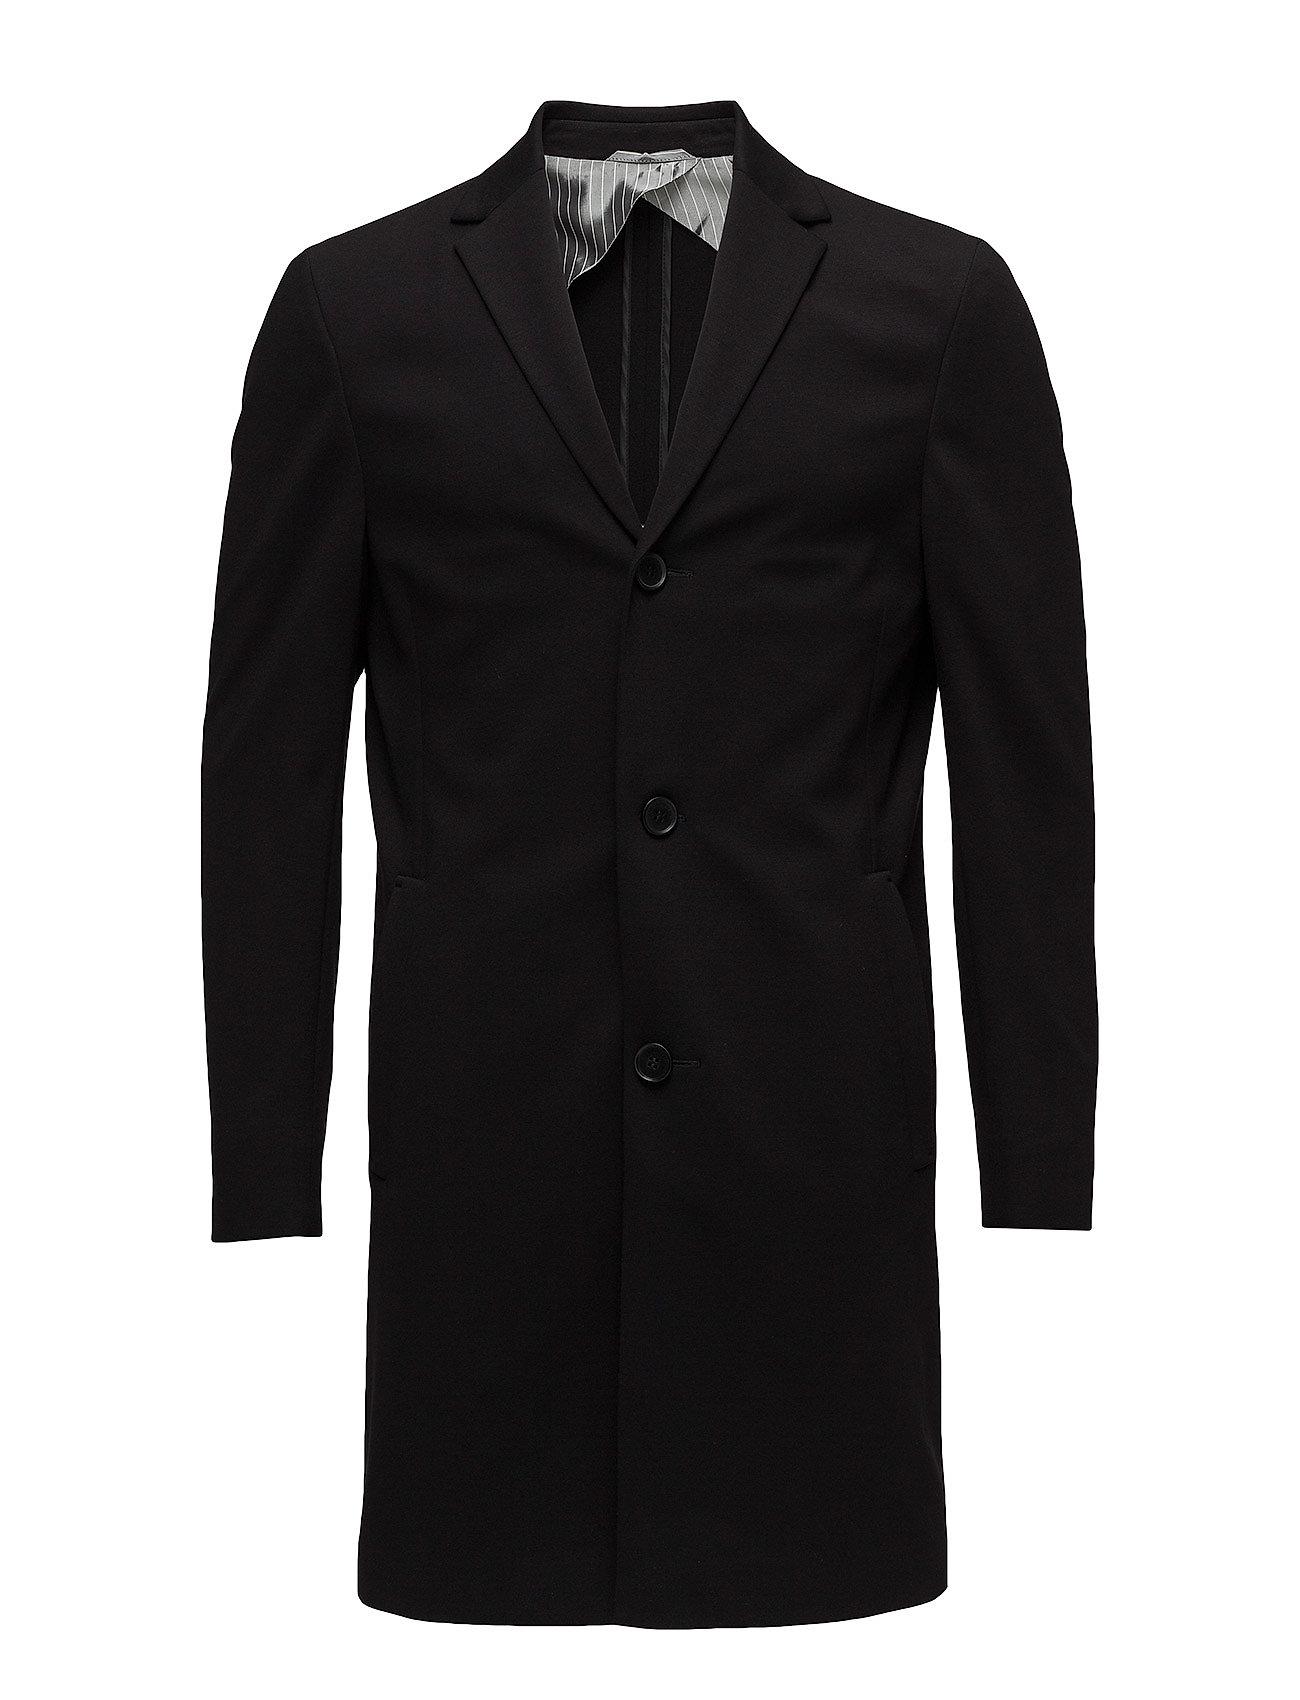 Calvin Klein CARLO-U COMPACT JERS - PERFECT BLACK